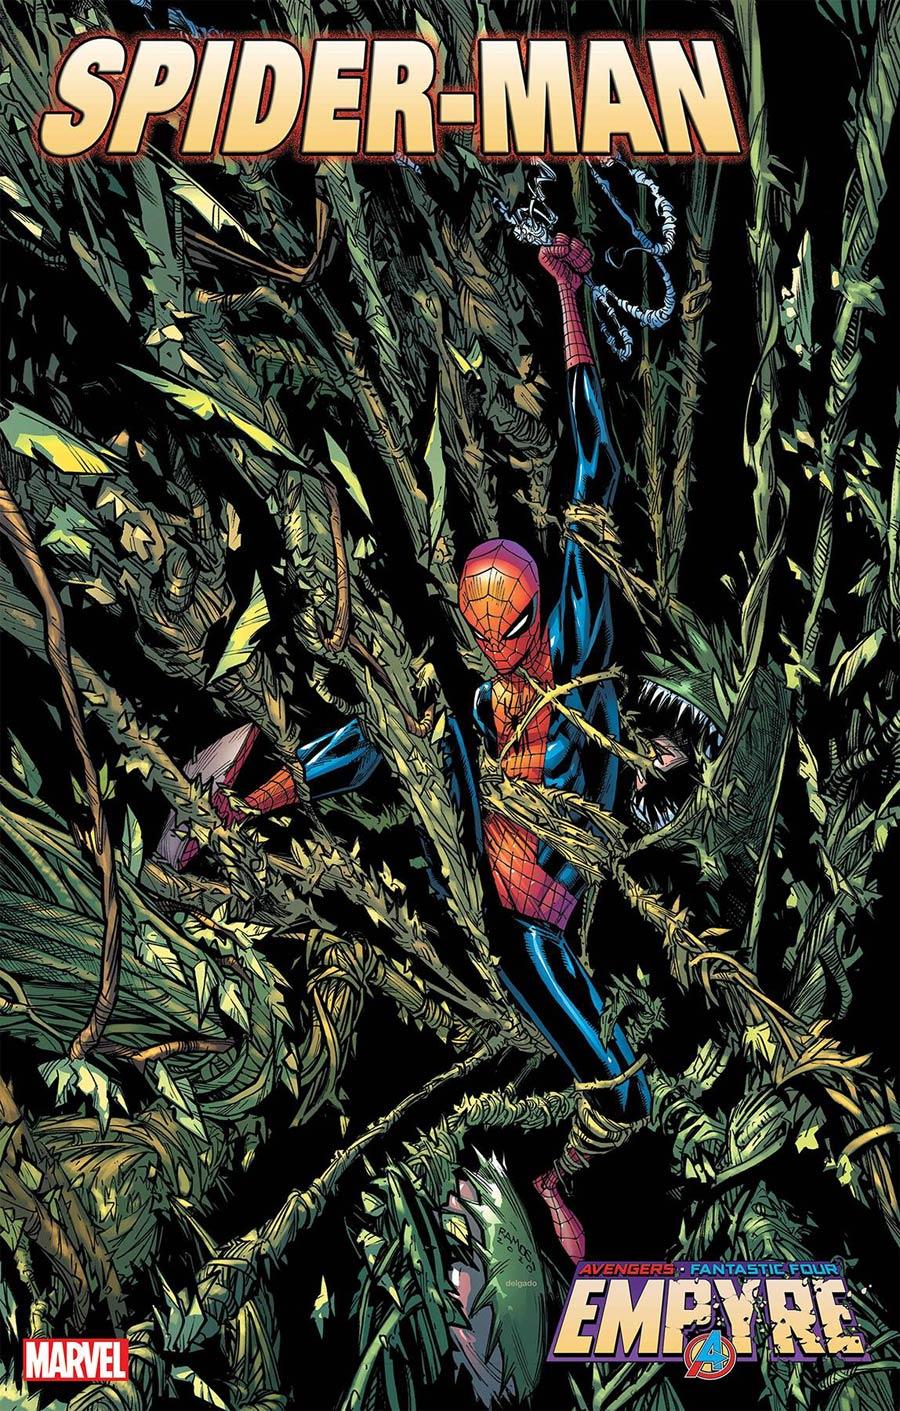 Empyre Spider-Man #2 Cover A Regular Humberto Ramos Cover